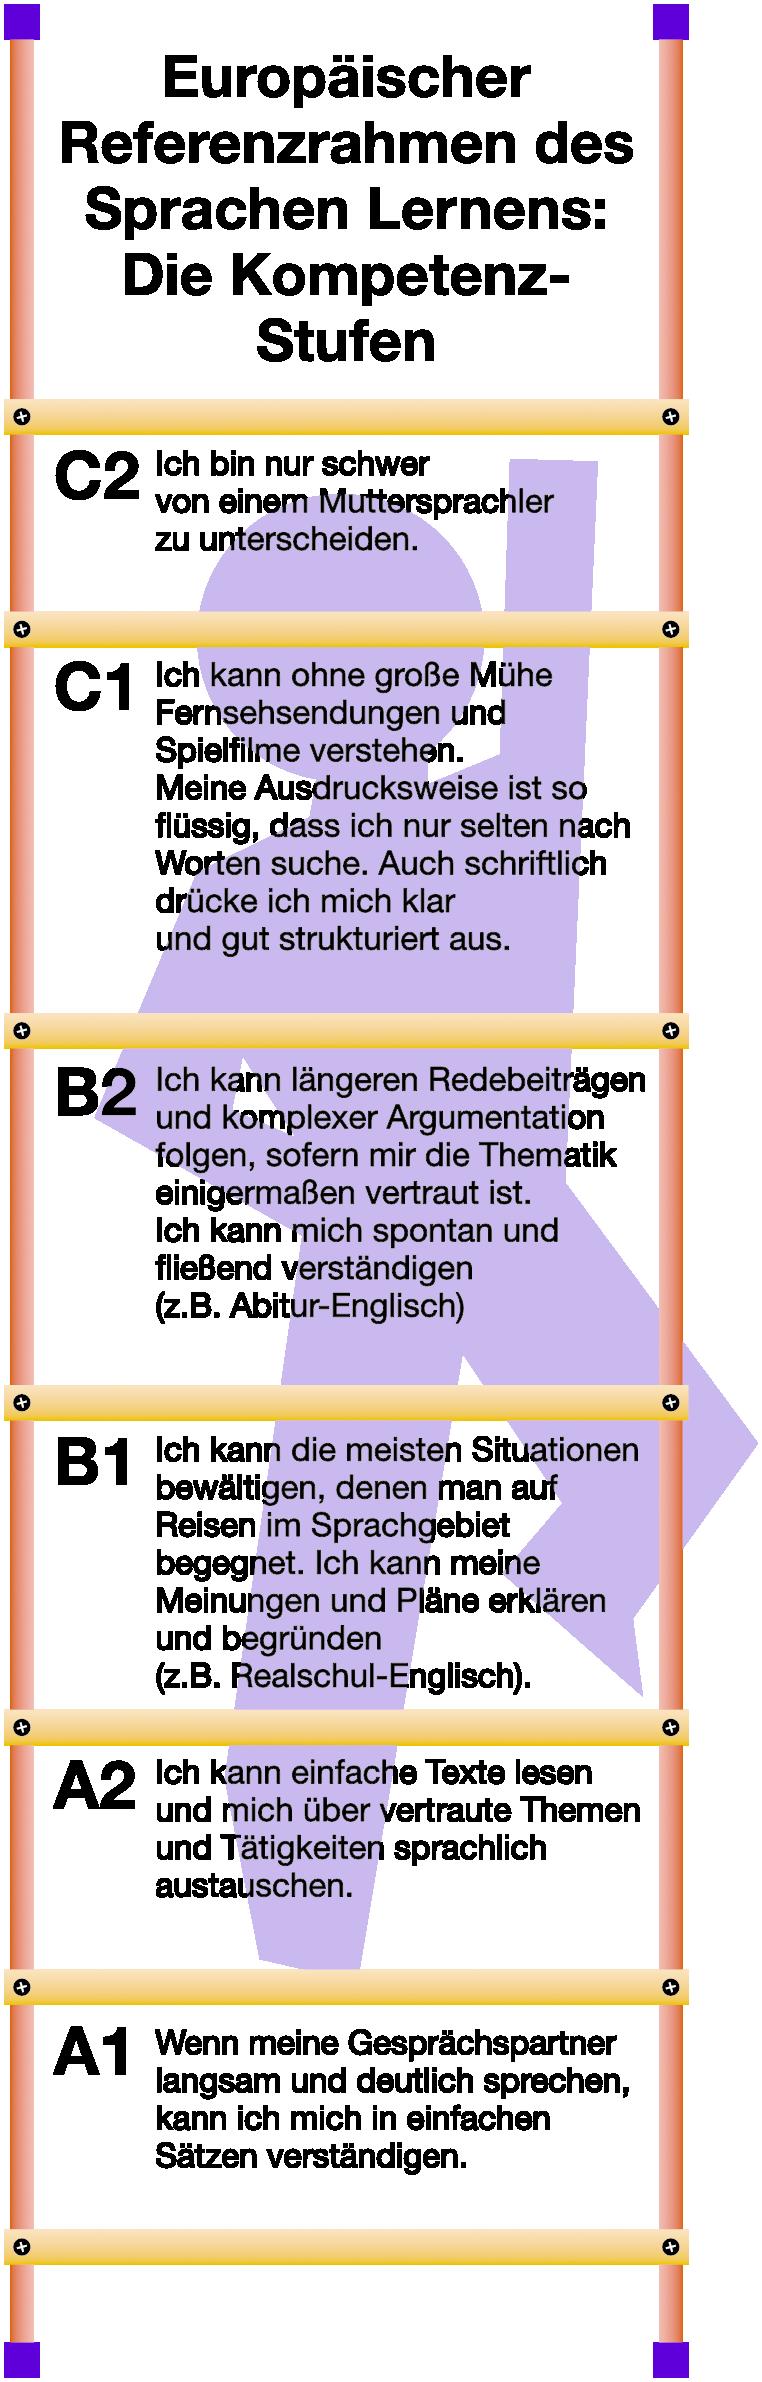 vhs-luedinghausen.de